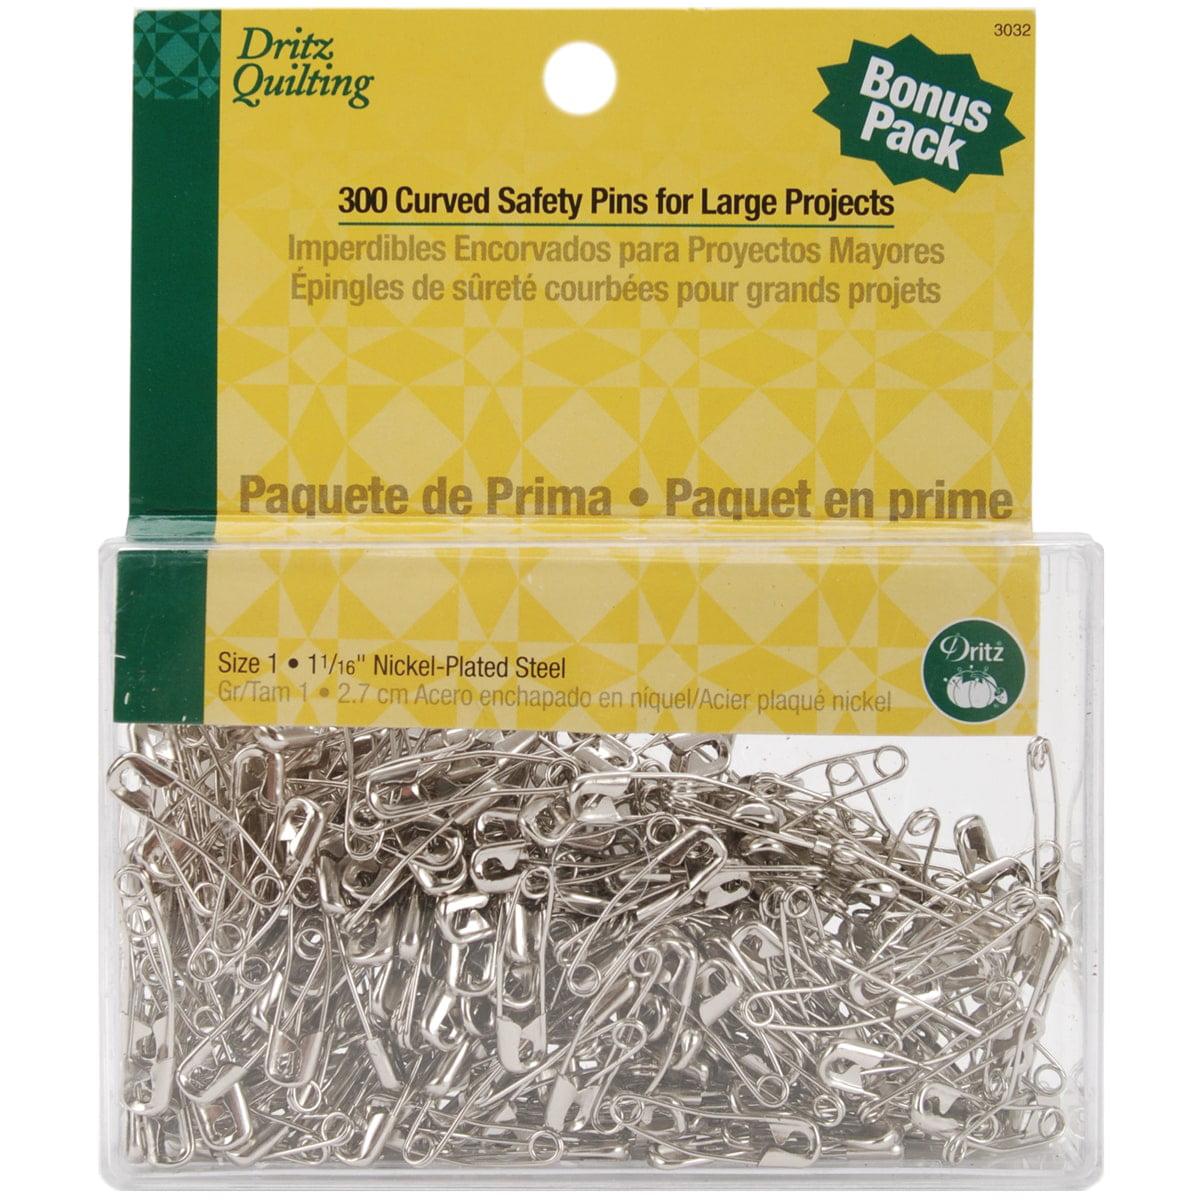 Dritz Quilting Curved Basting Pins Bonus Pack 300/Pkg-Size 1